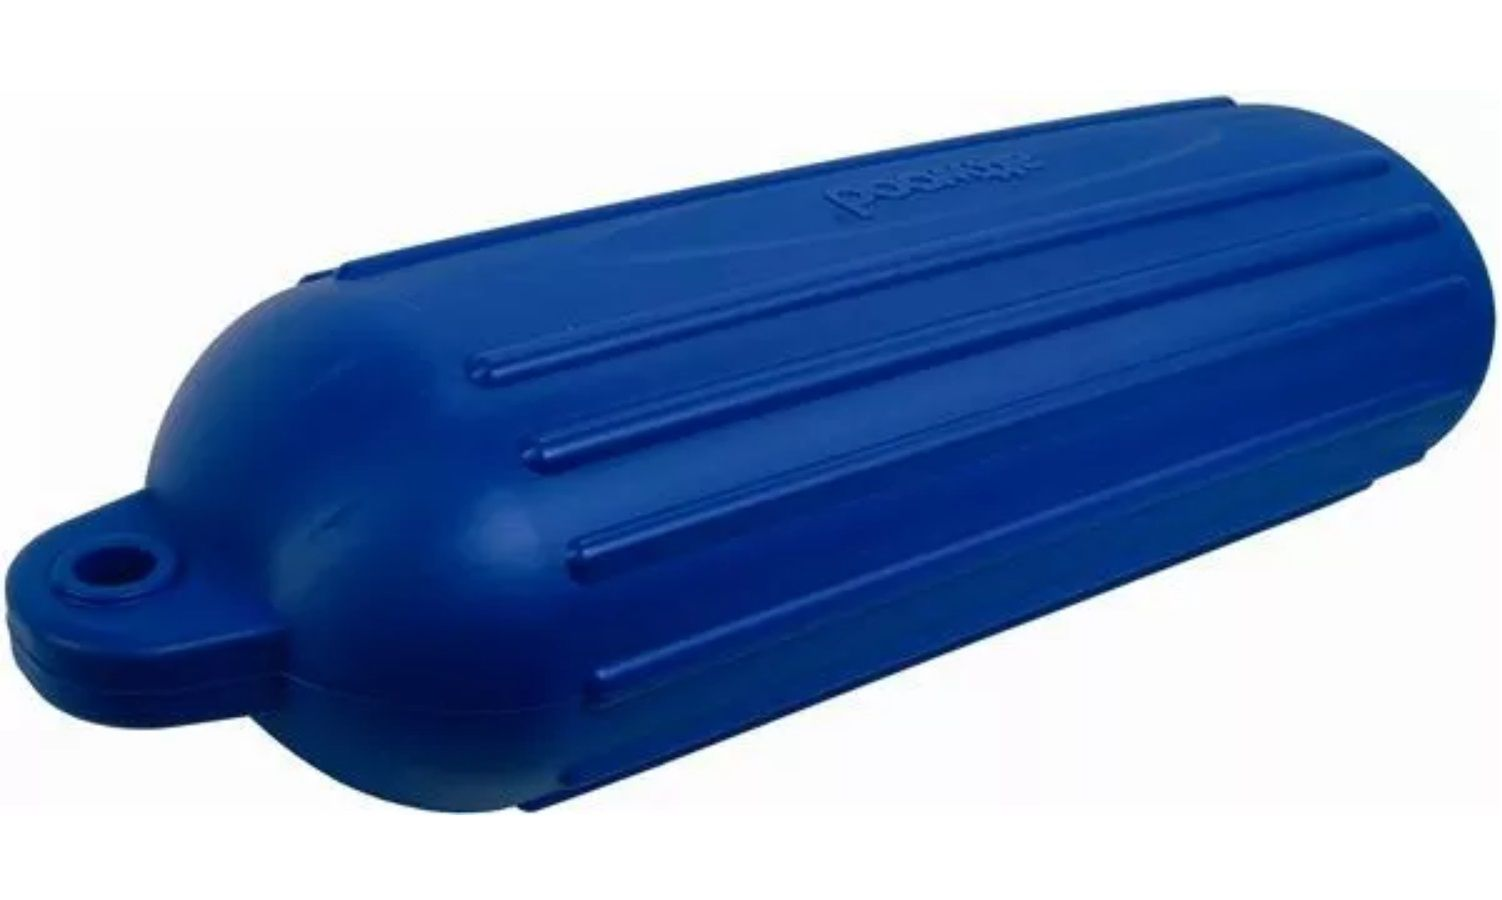 Defensa Náutica G2 Azul 10 X 41 cm Attwood para Barcos e Lanchas